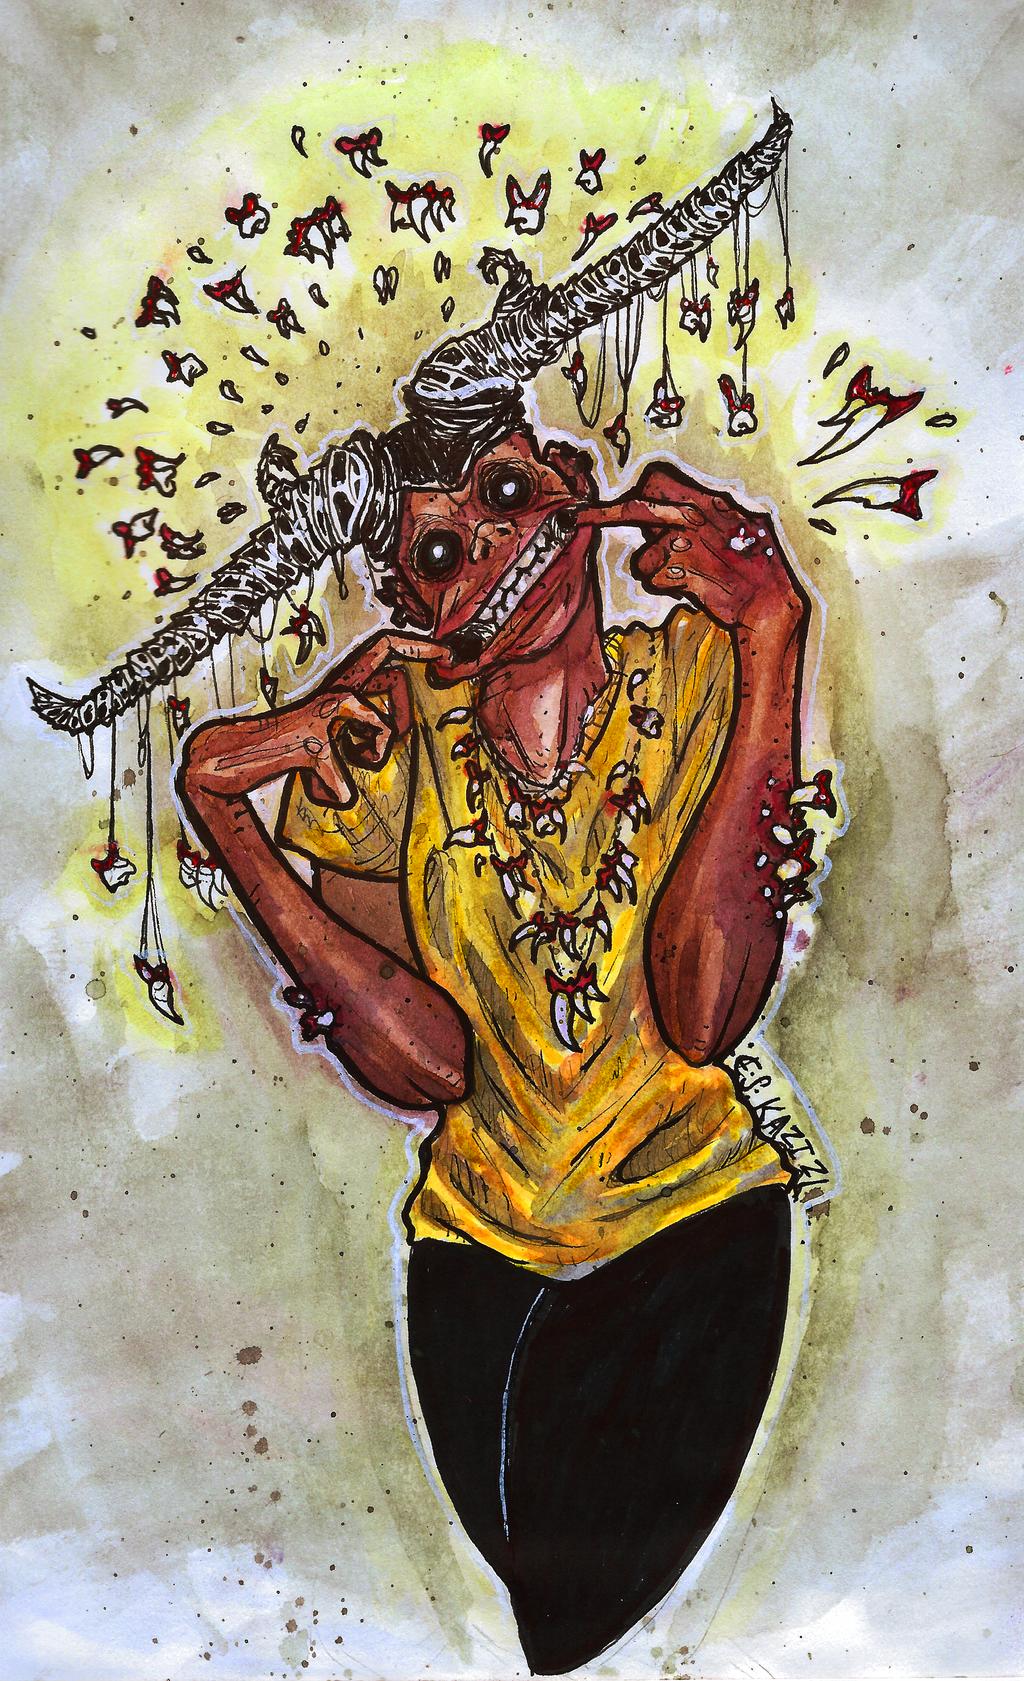 Inktober #3: Collector by Kazocks